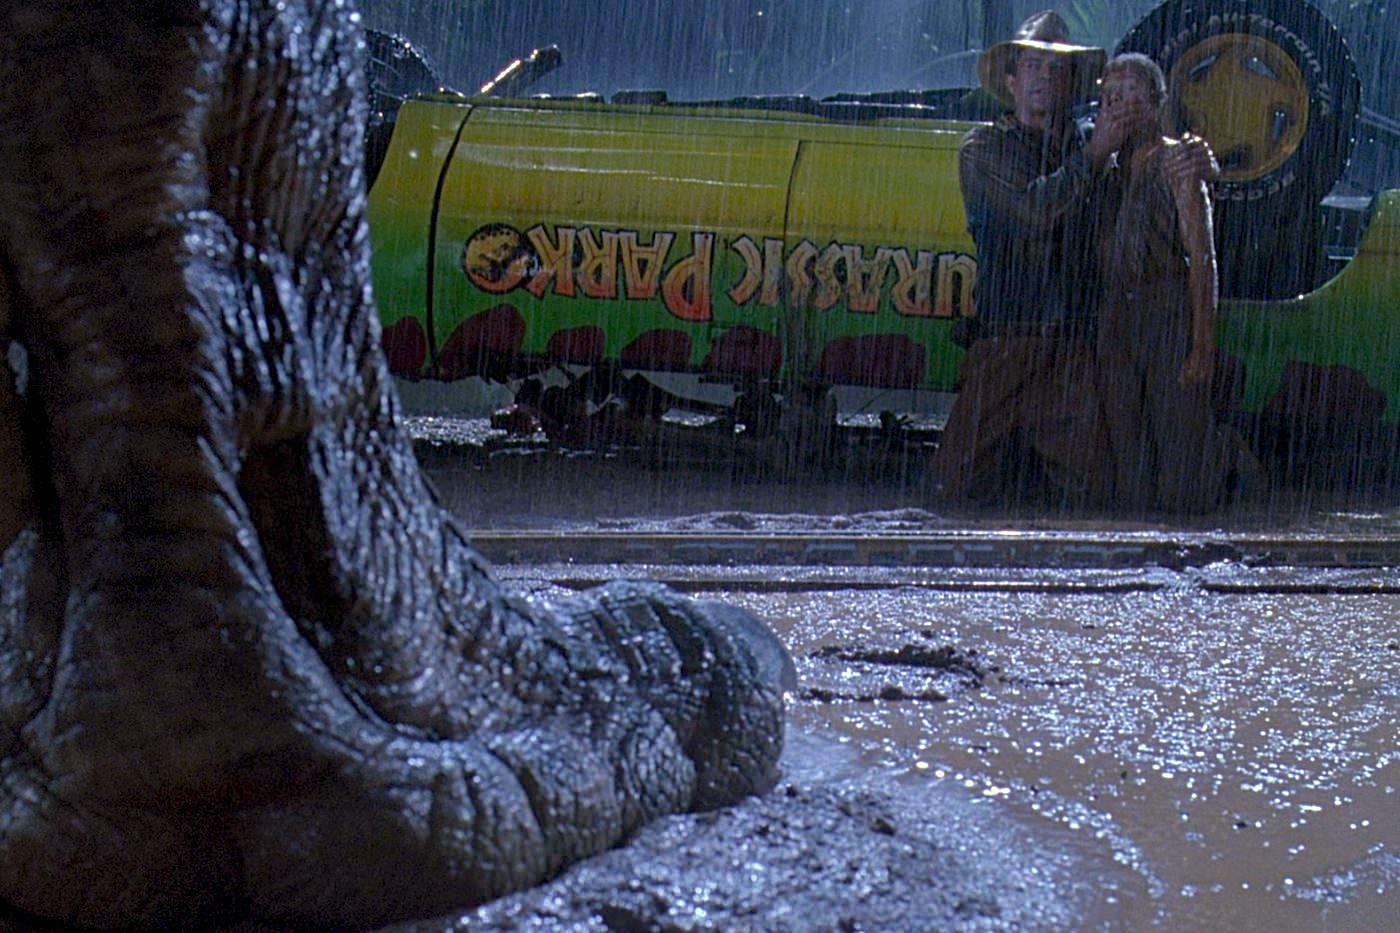 Jurassic park sam neil